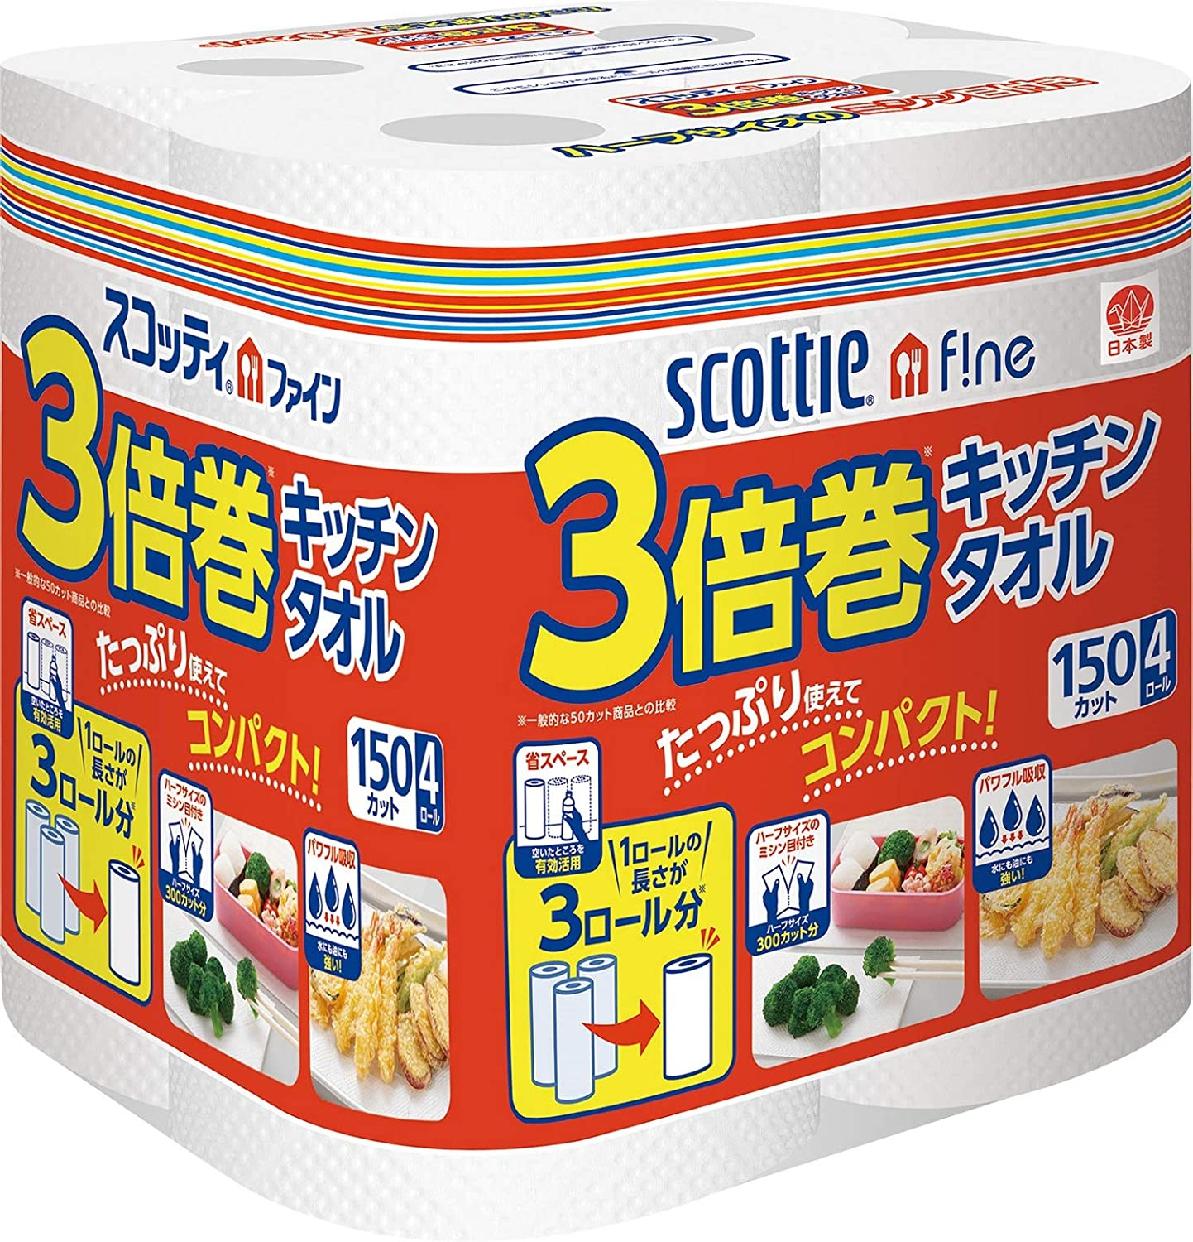 scottie(スコッティ) 3倍巻きキッチンタオルの商品画像2